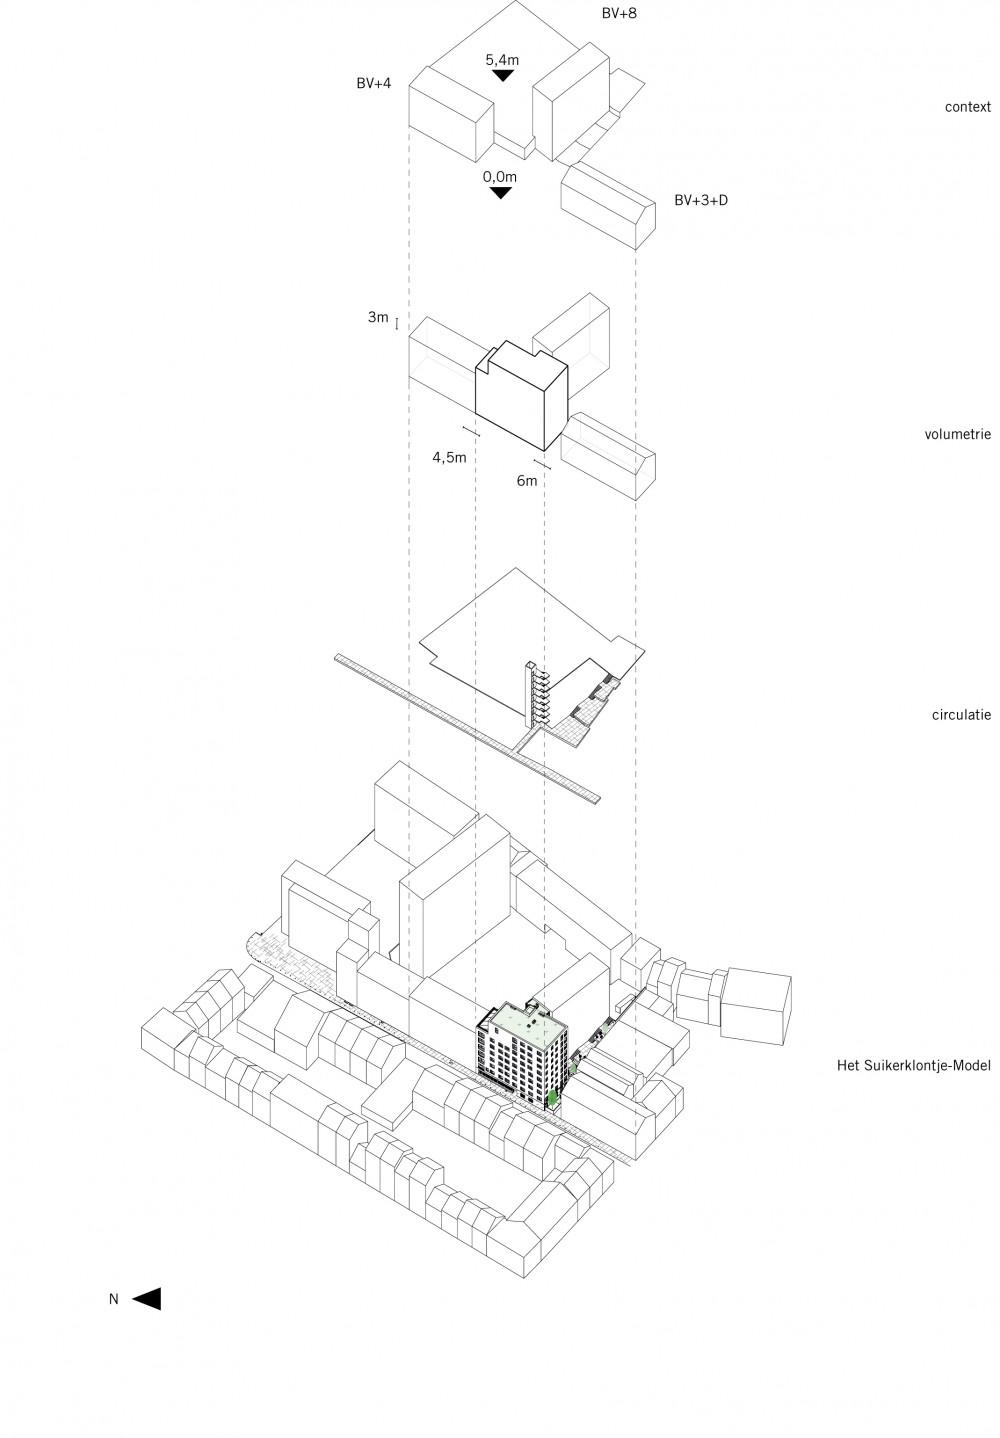 Abscis Architecten - Conceptschema - visualisatie Team HENK